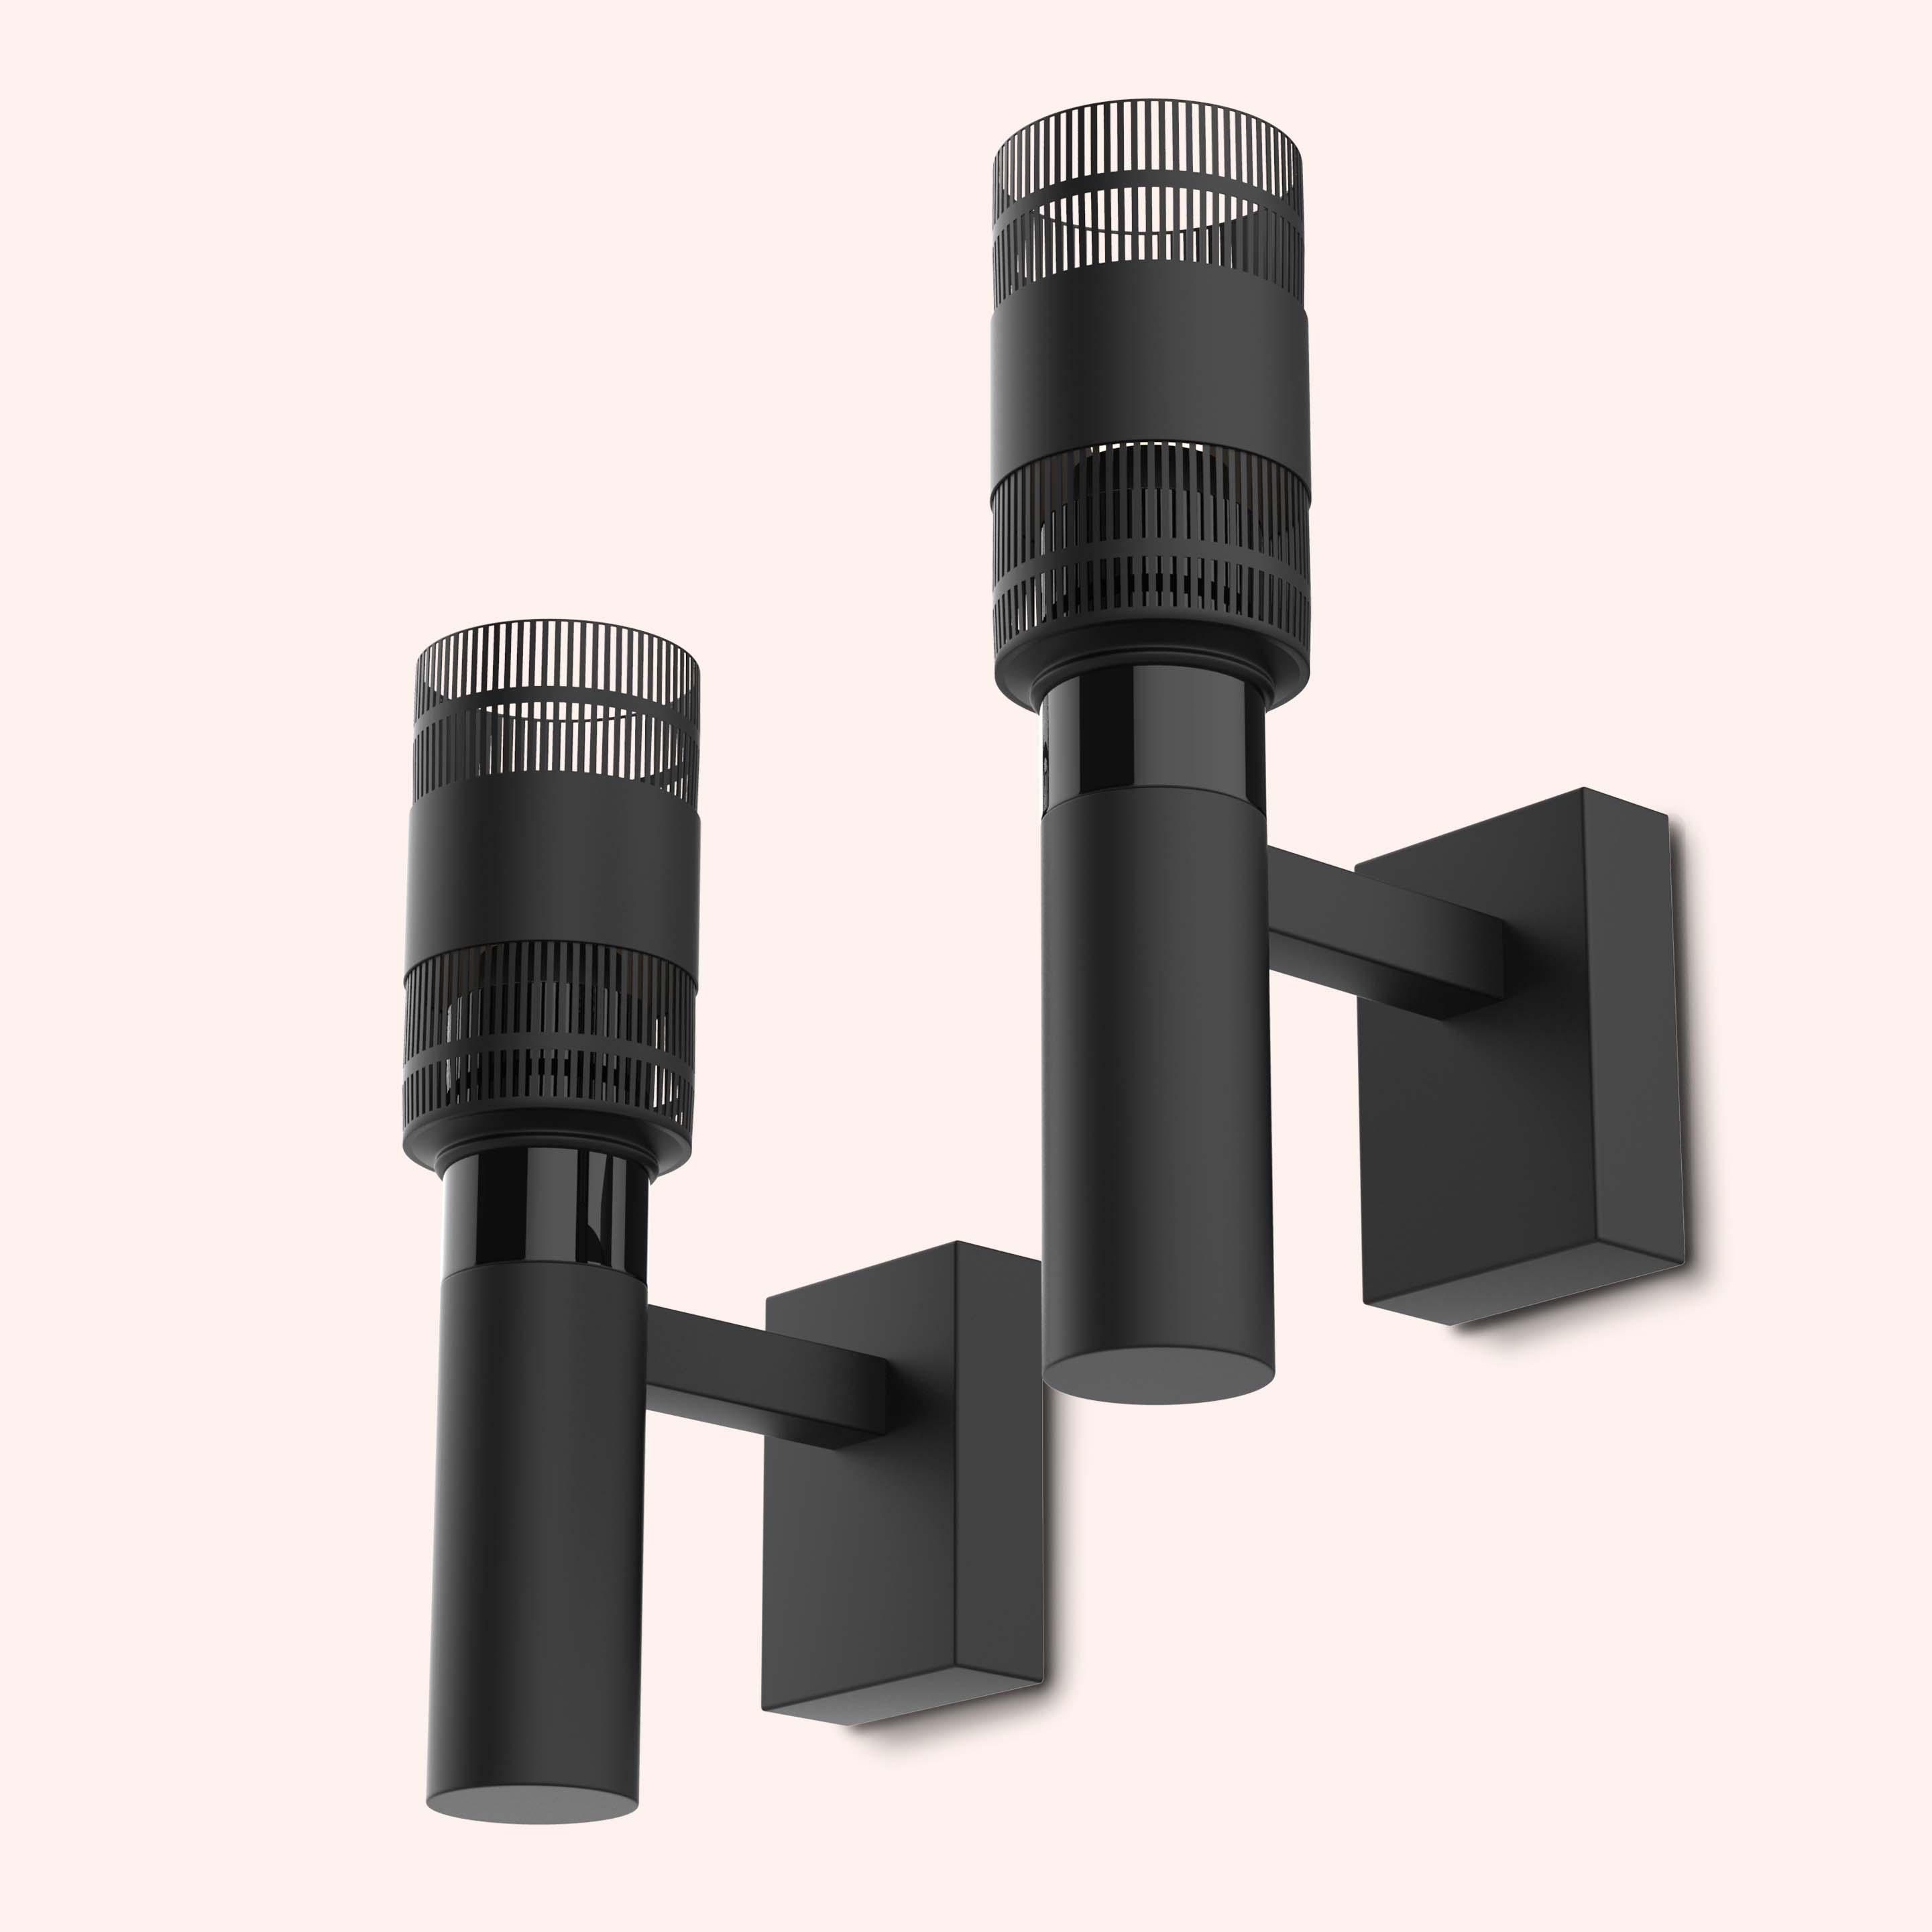 Minimalist Elegant Black Mouille Wall Lamp - 3D Model